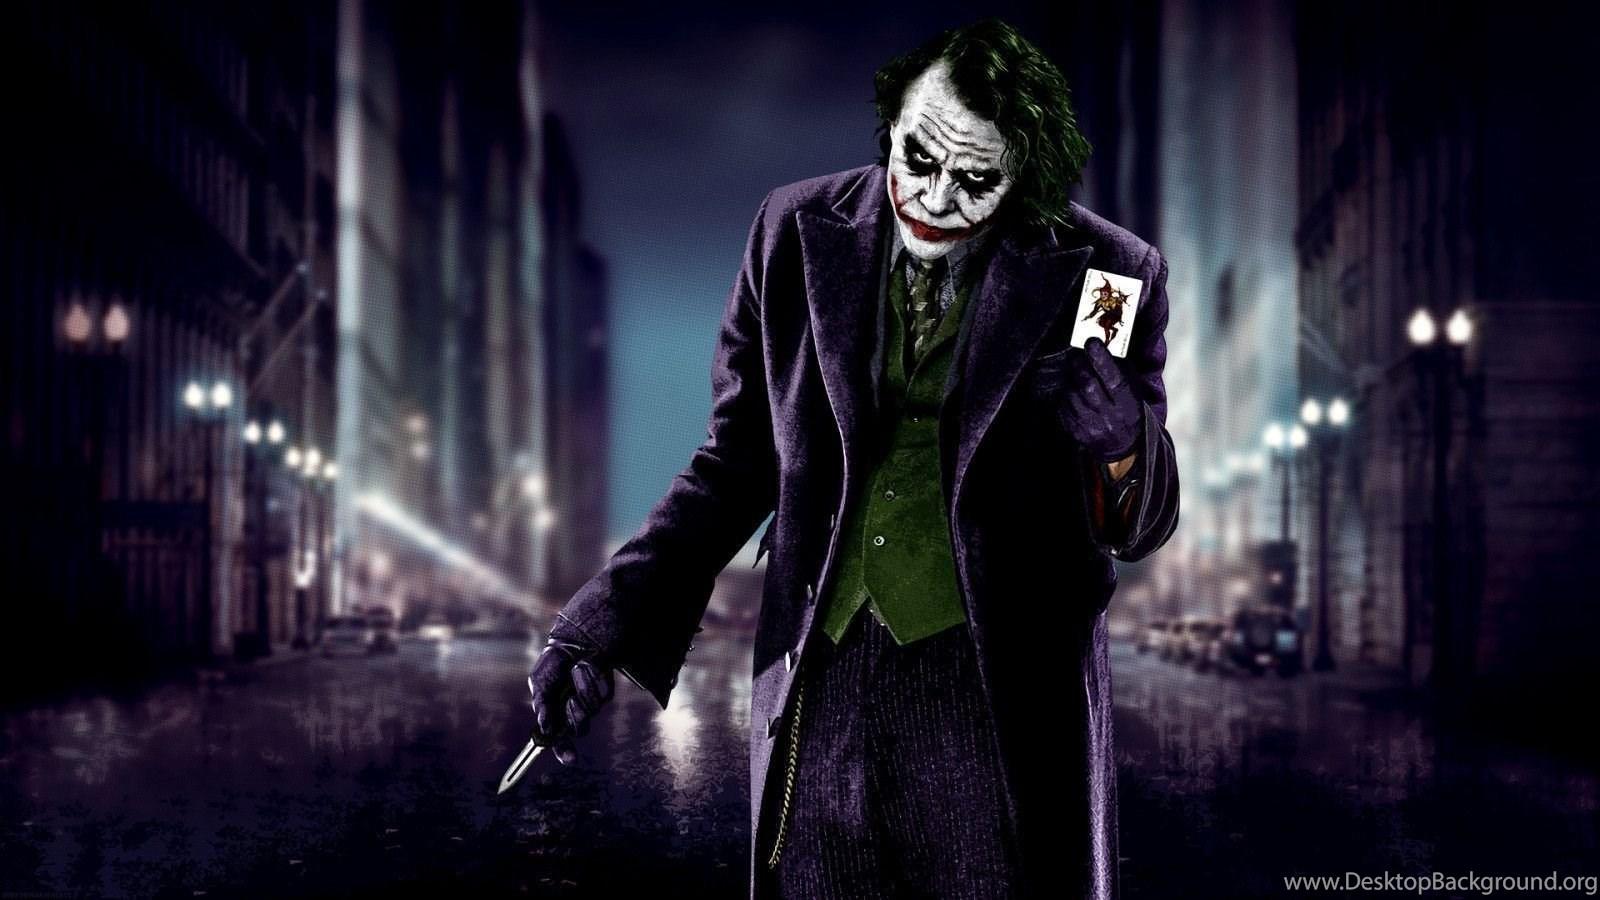 The Dark Knight Joker Wallpapers Wallpapers Cave Desktop Background